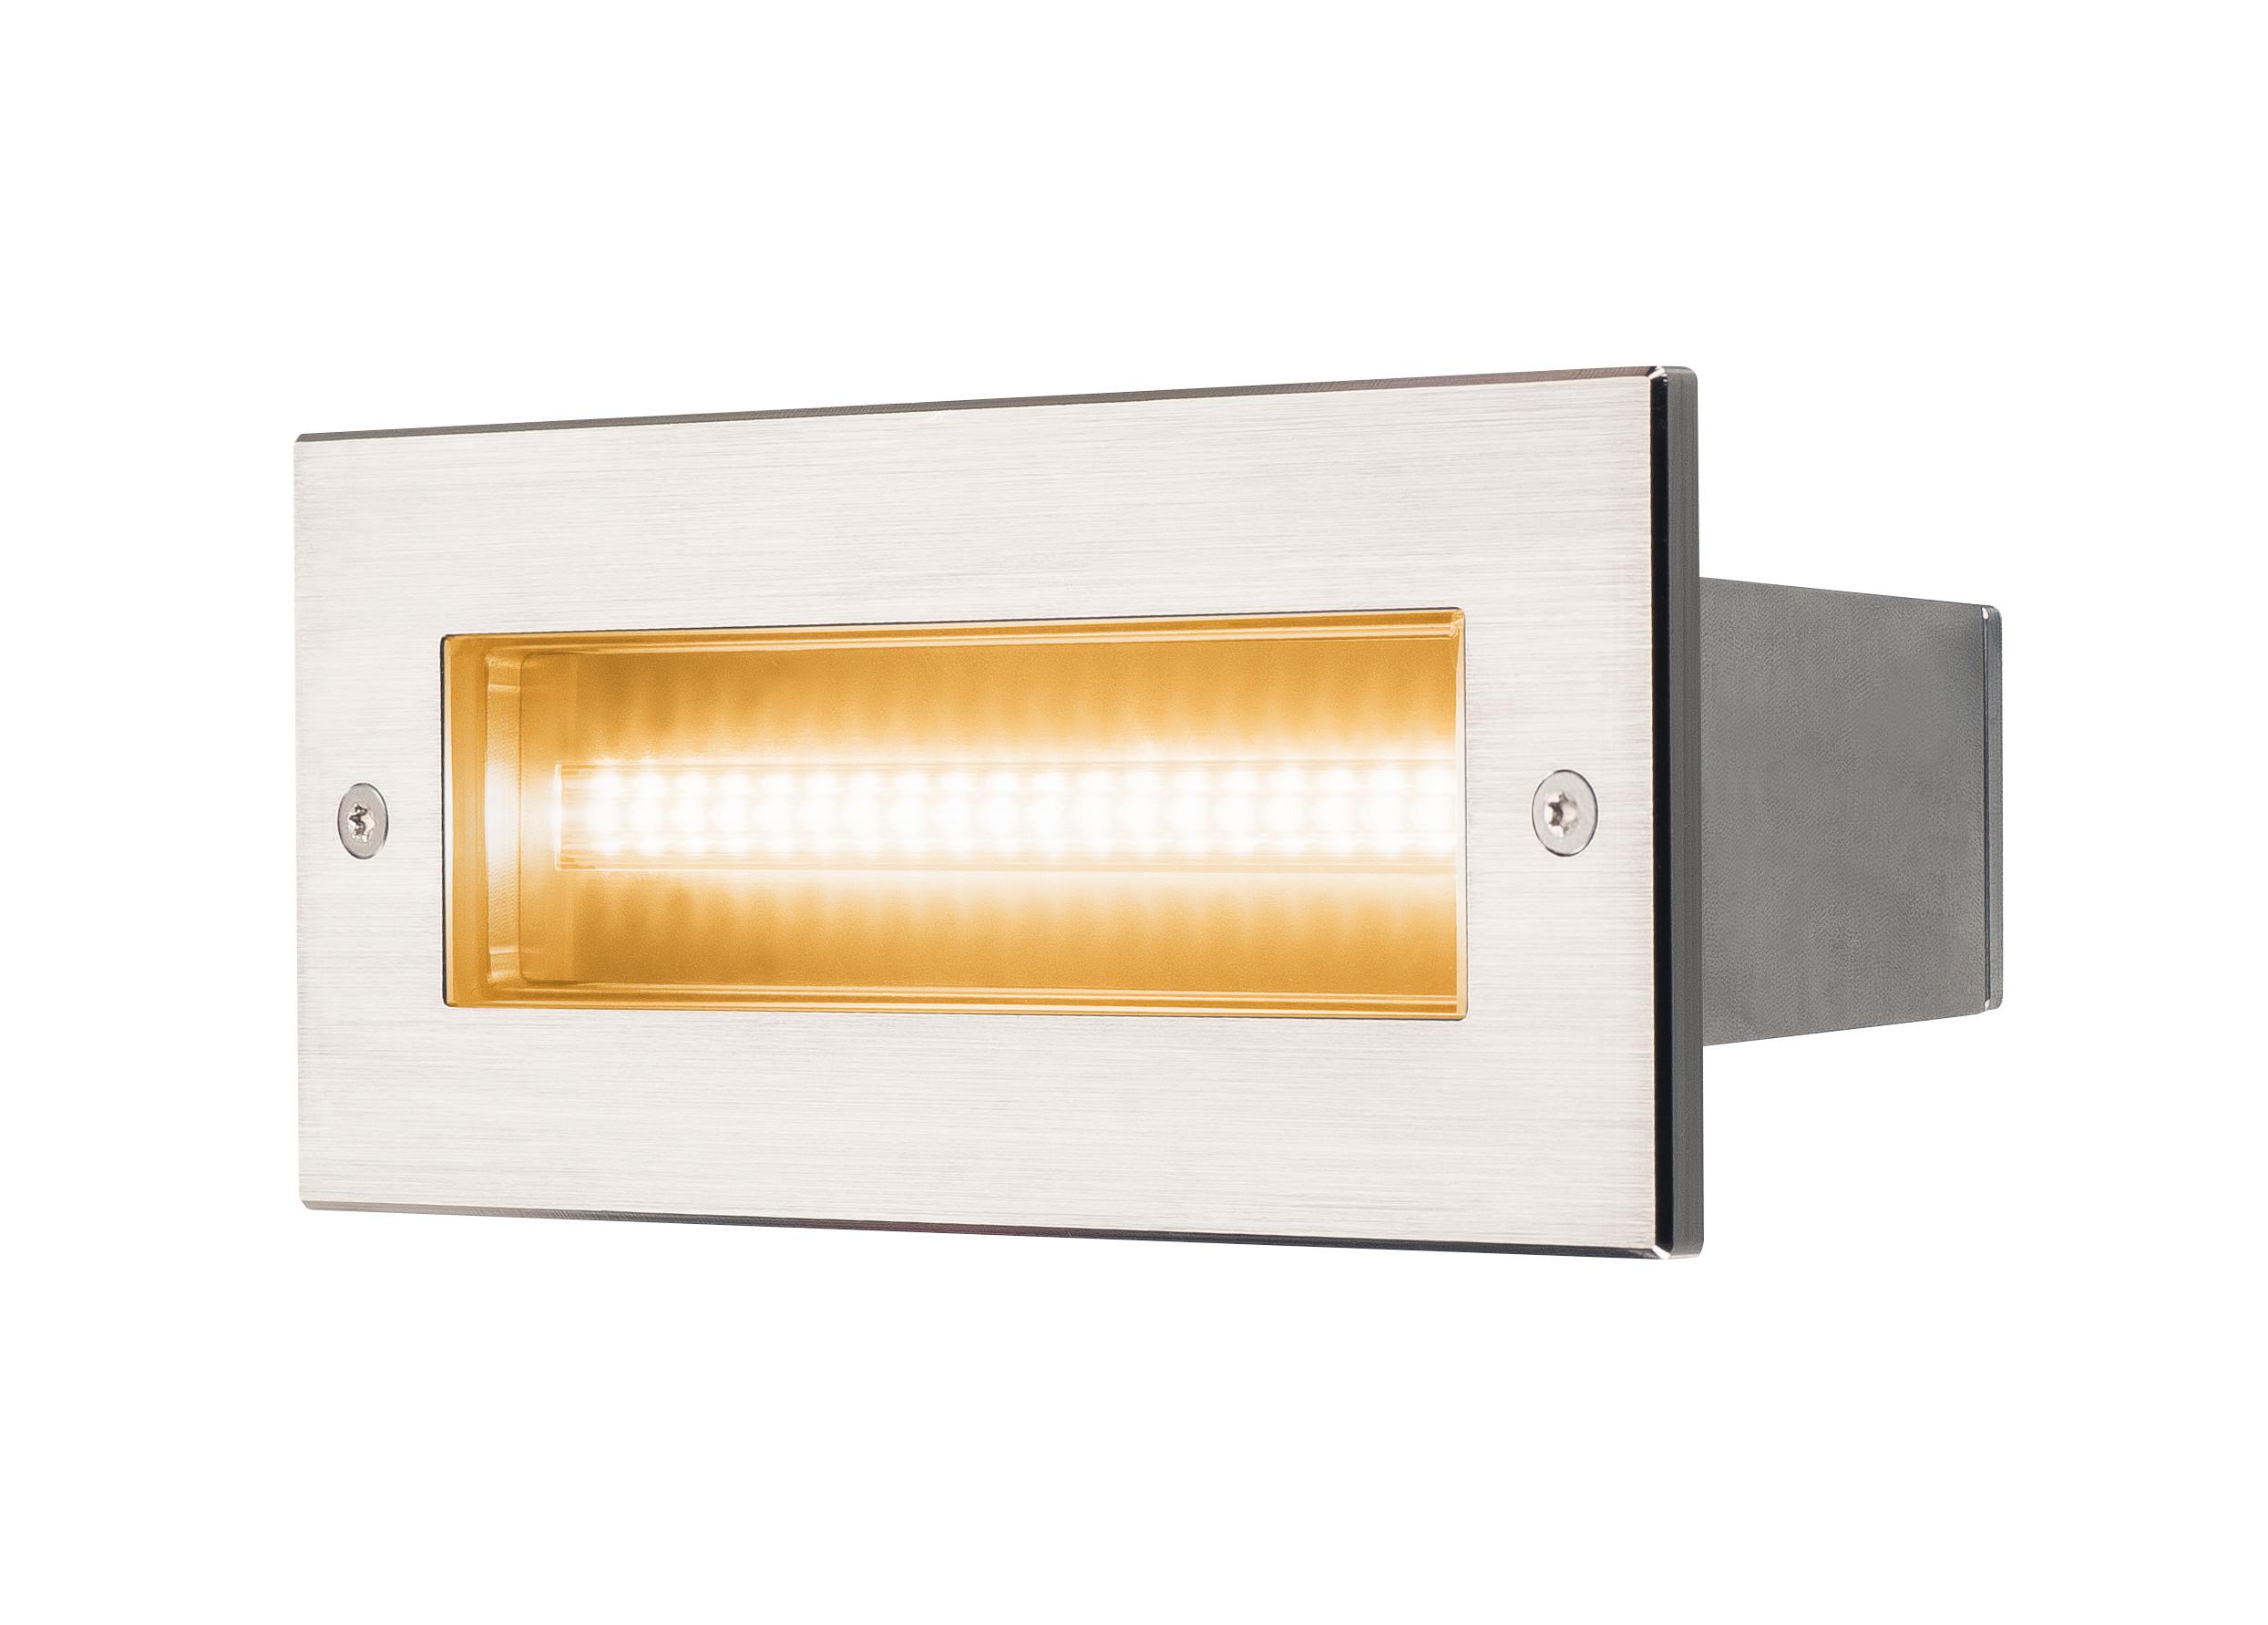 1 Stk BRICK Pro LED, Outdoor Wandeinbauleuchte, 230V, IP67, 950lm LI233651--